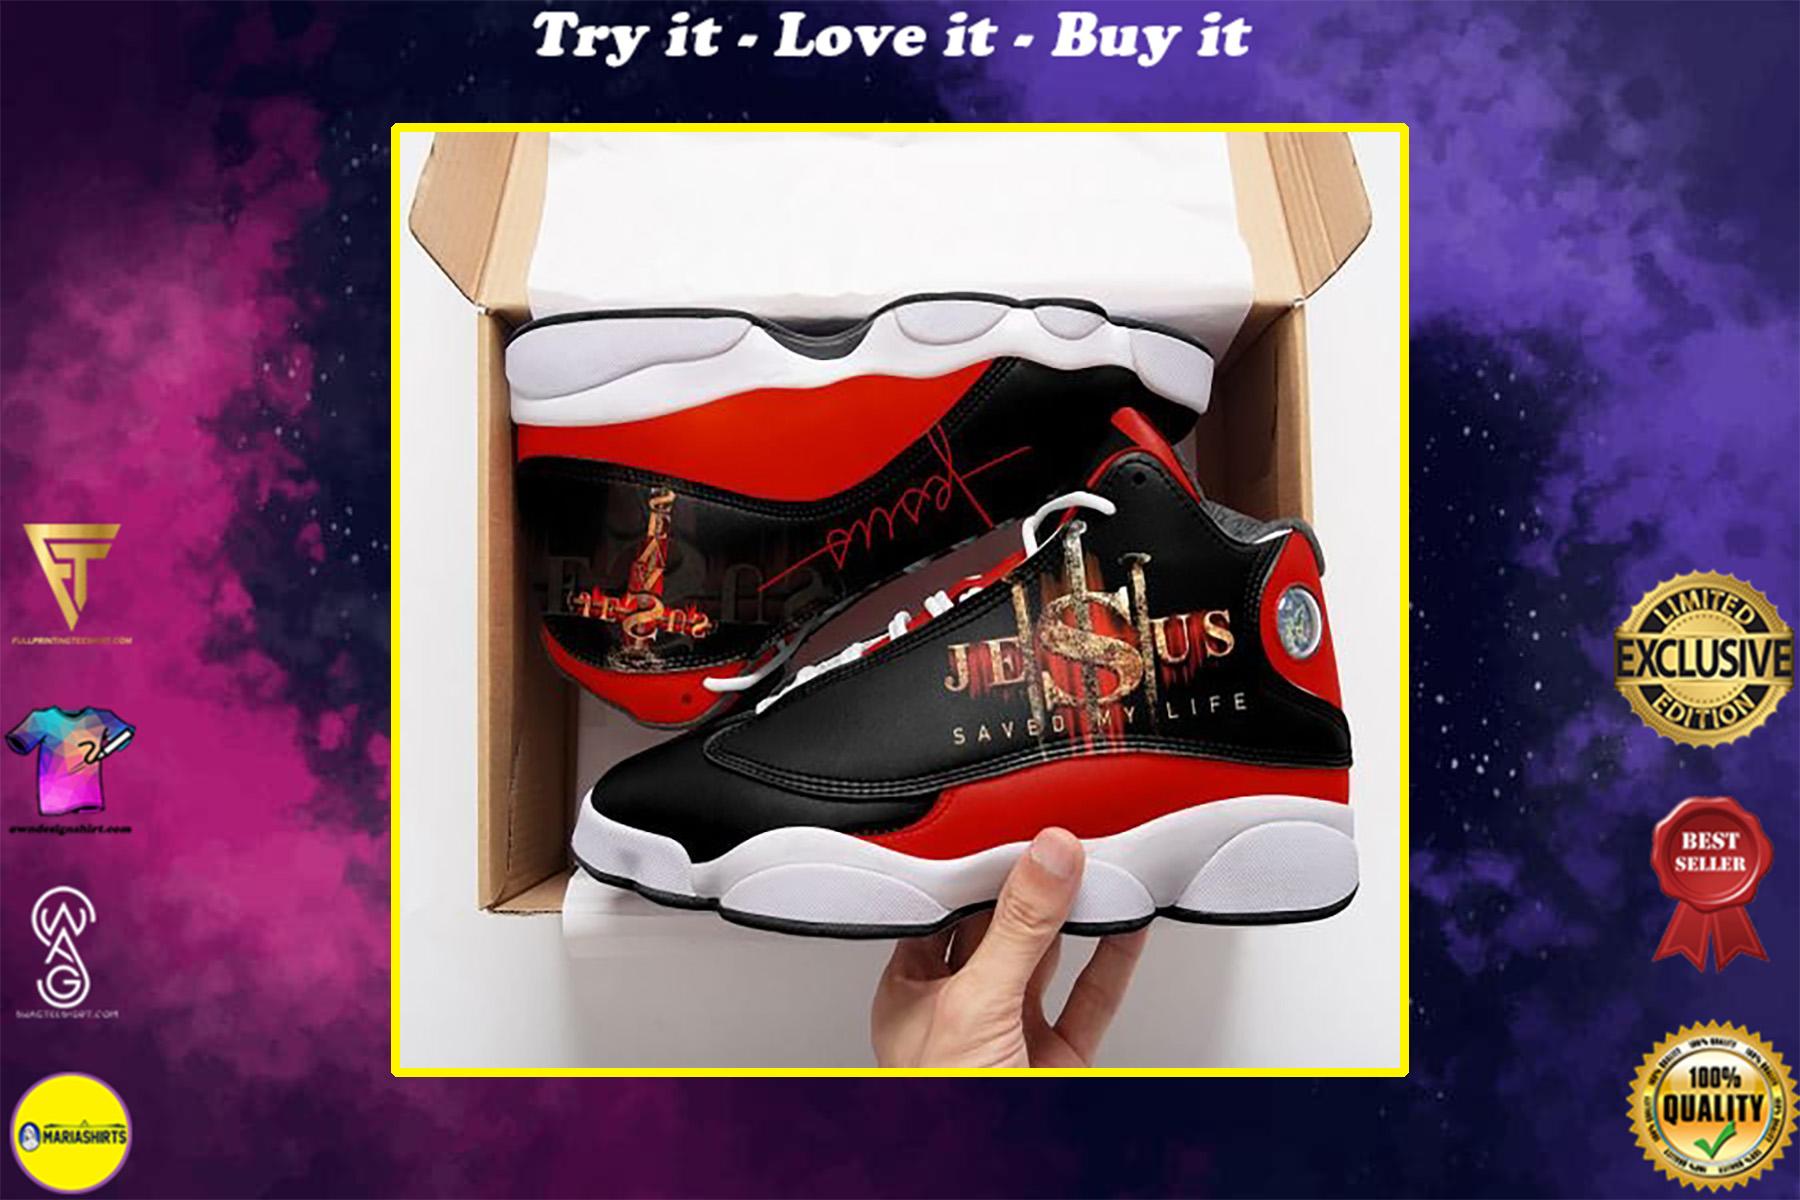 Jesus saved my life all over printed air jordan 13 sneakers